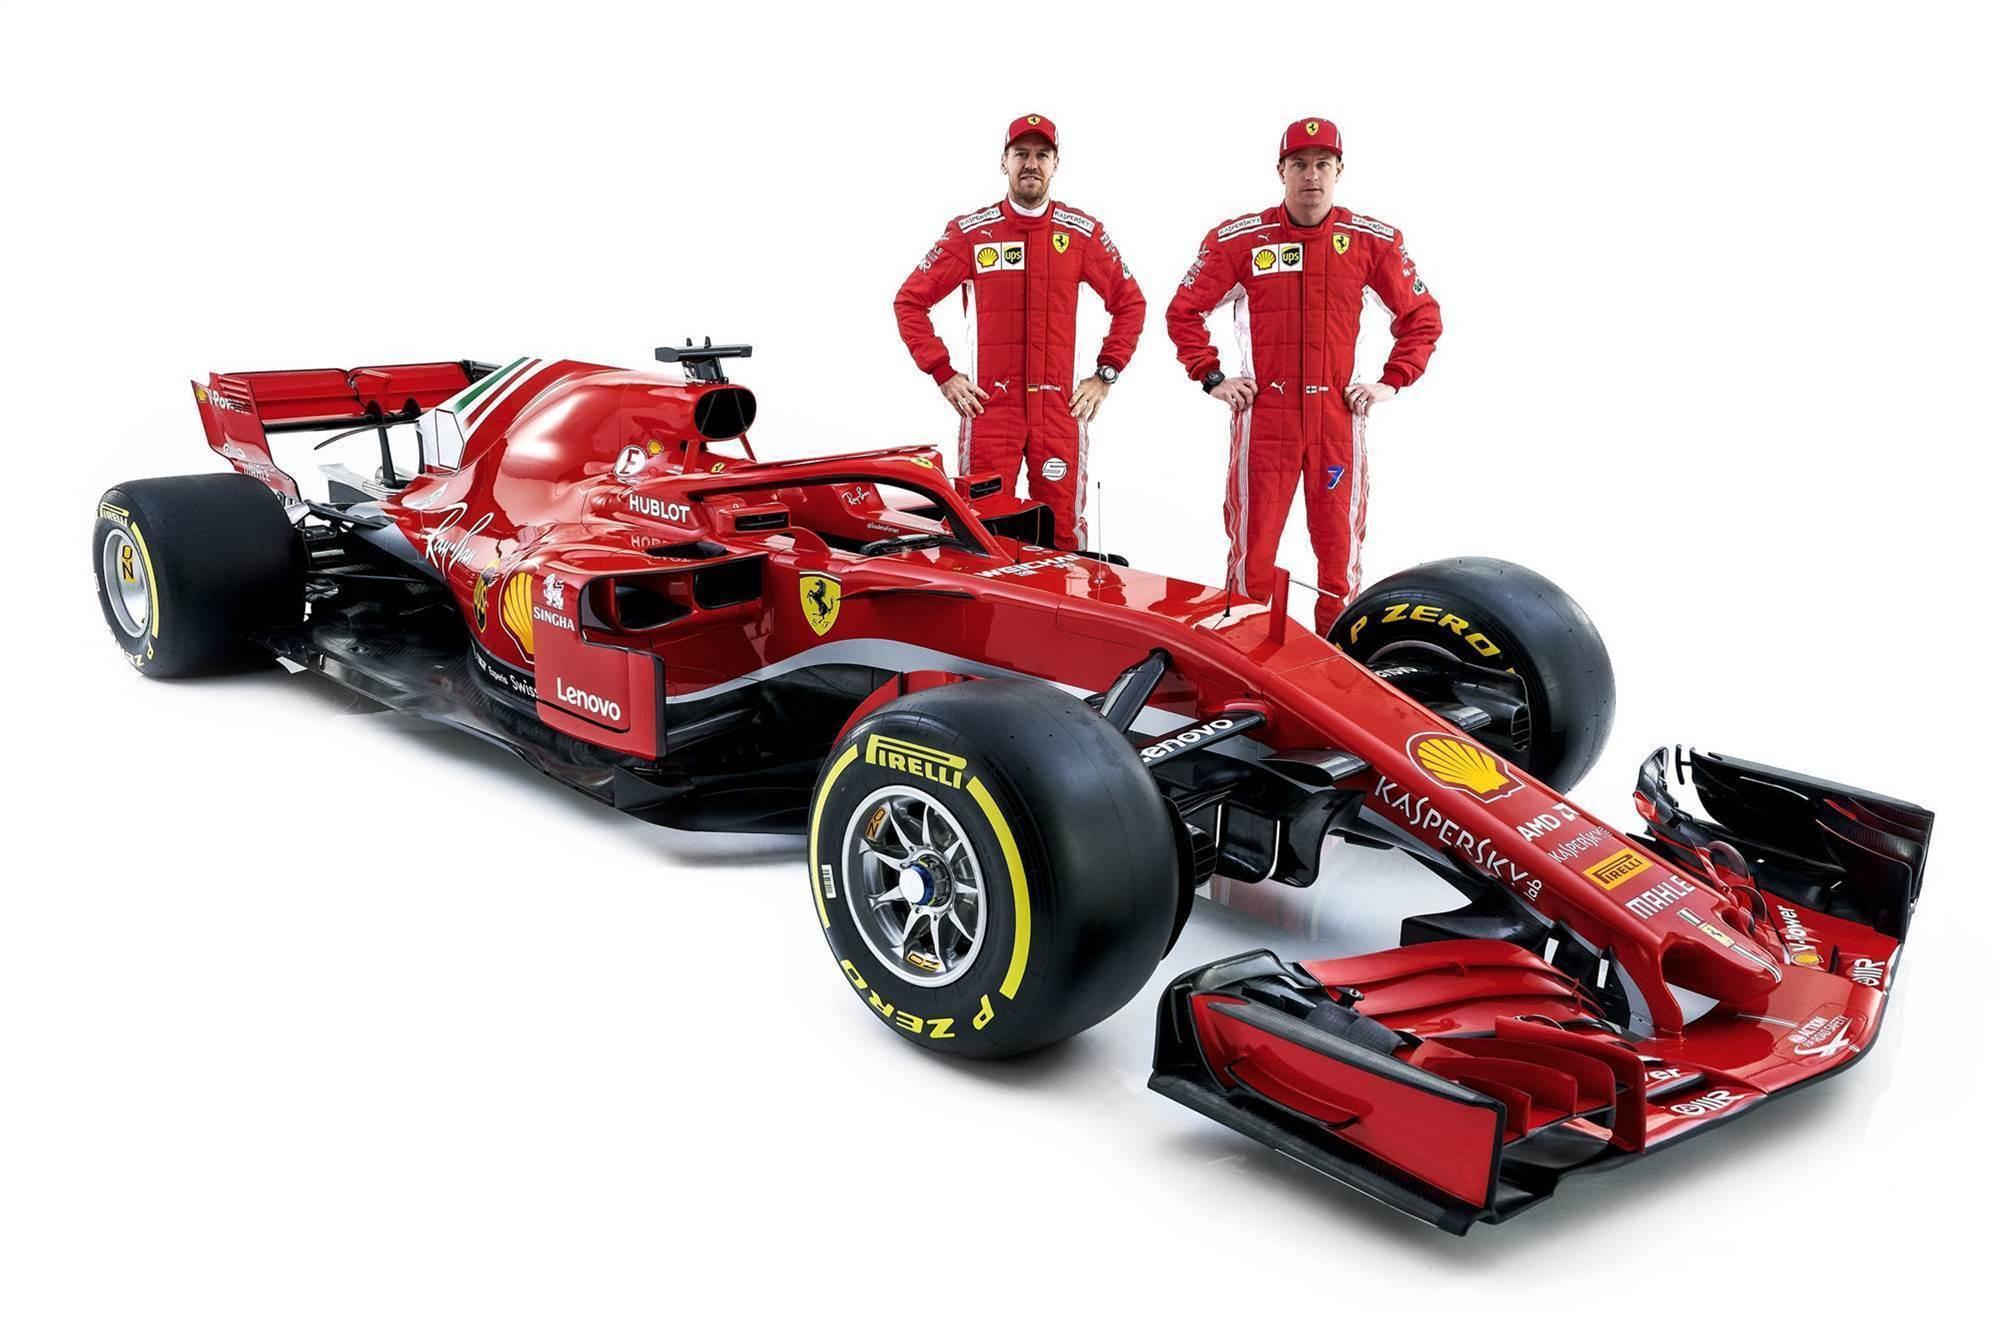 Ferrari launches new F1 contender